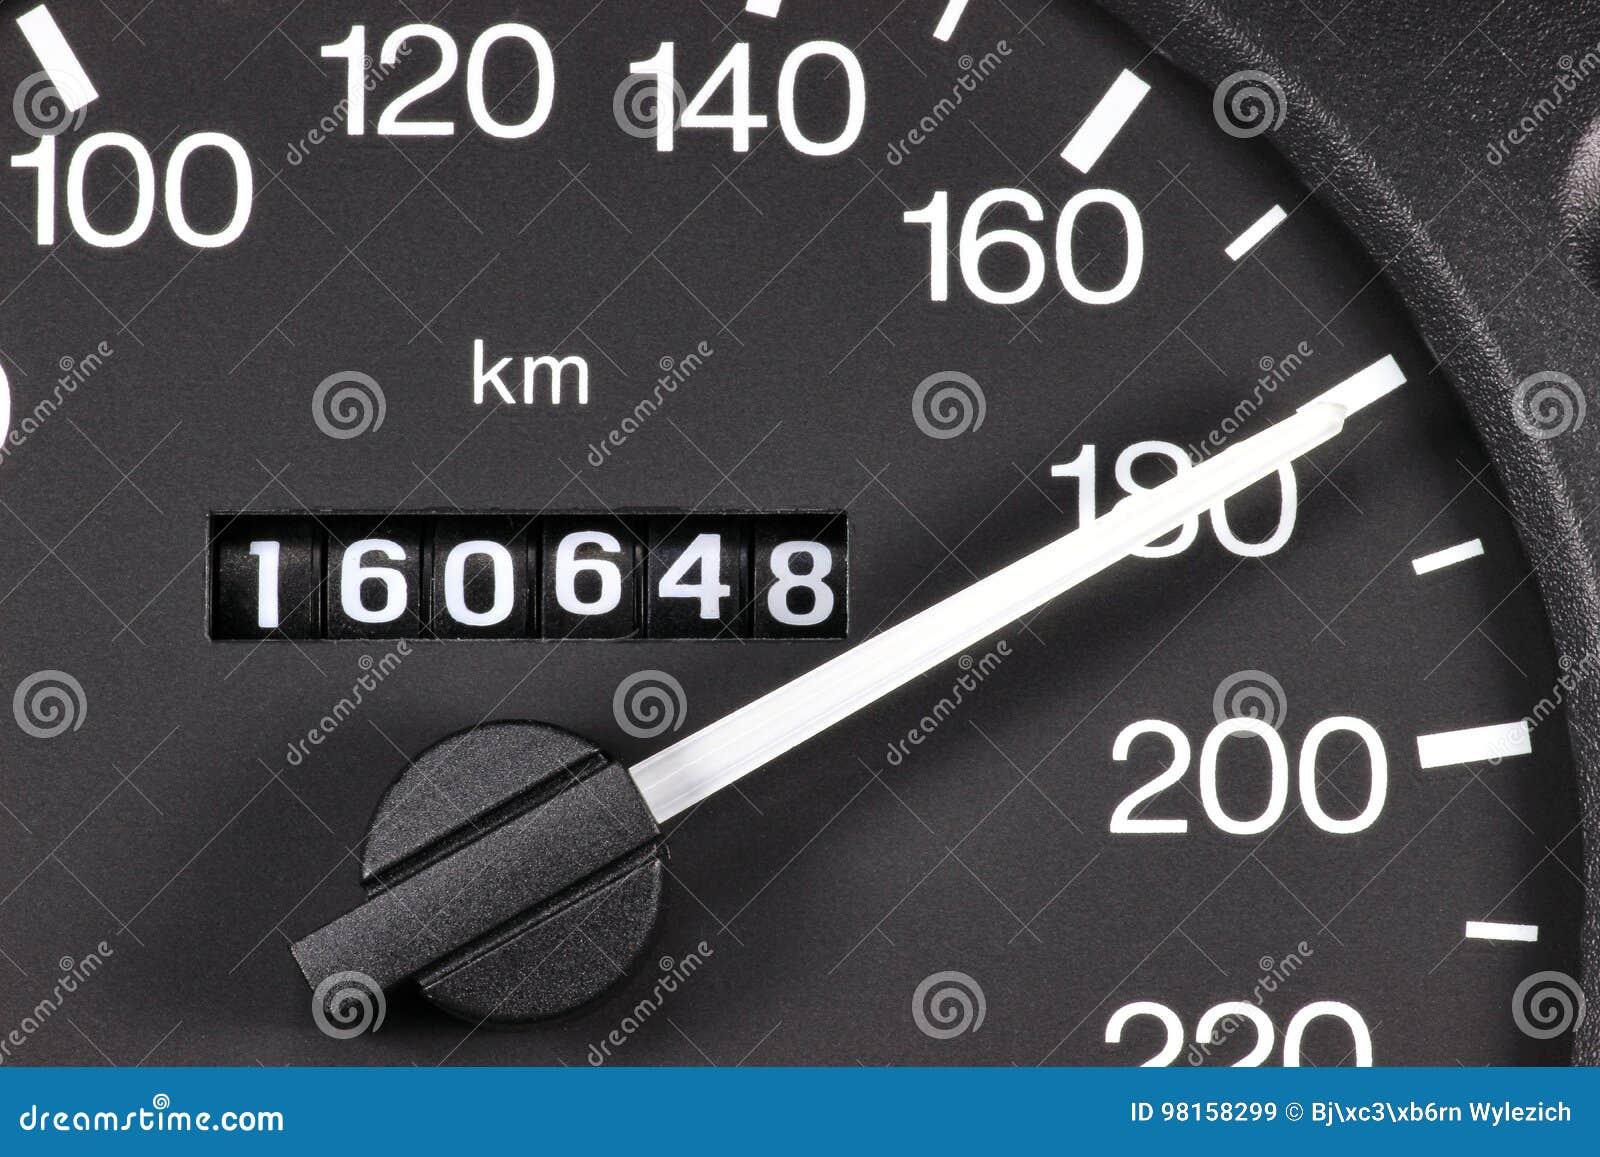 Snelheidsmeter bij 180 km/h